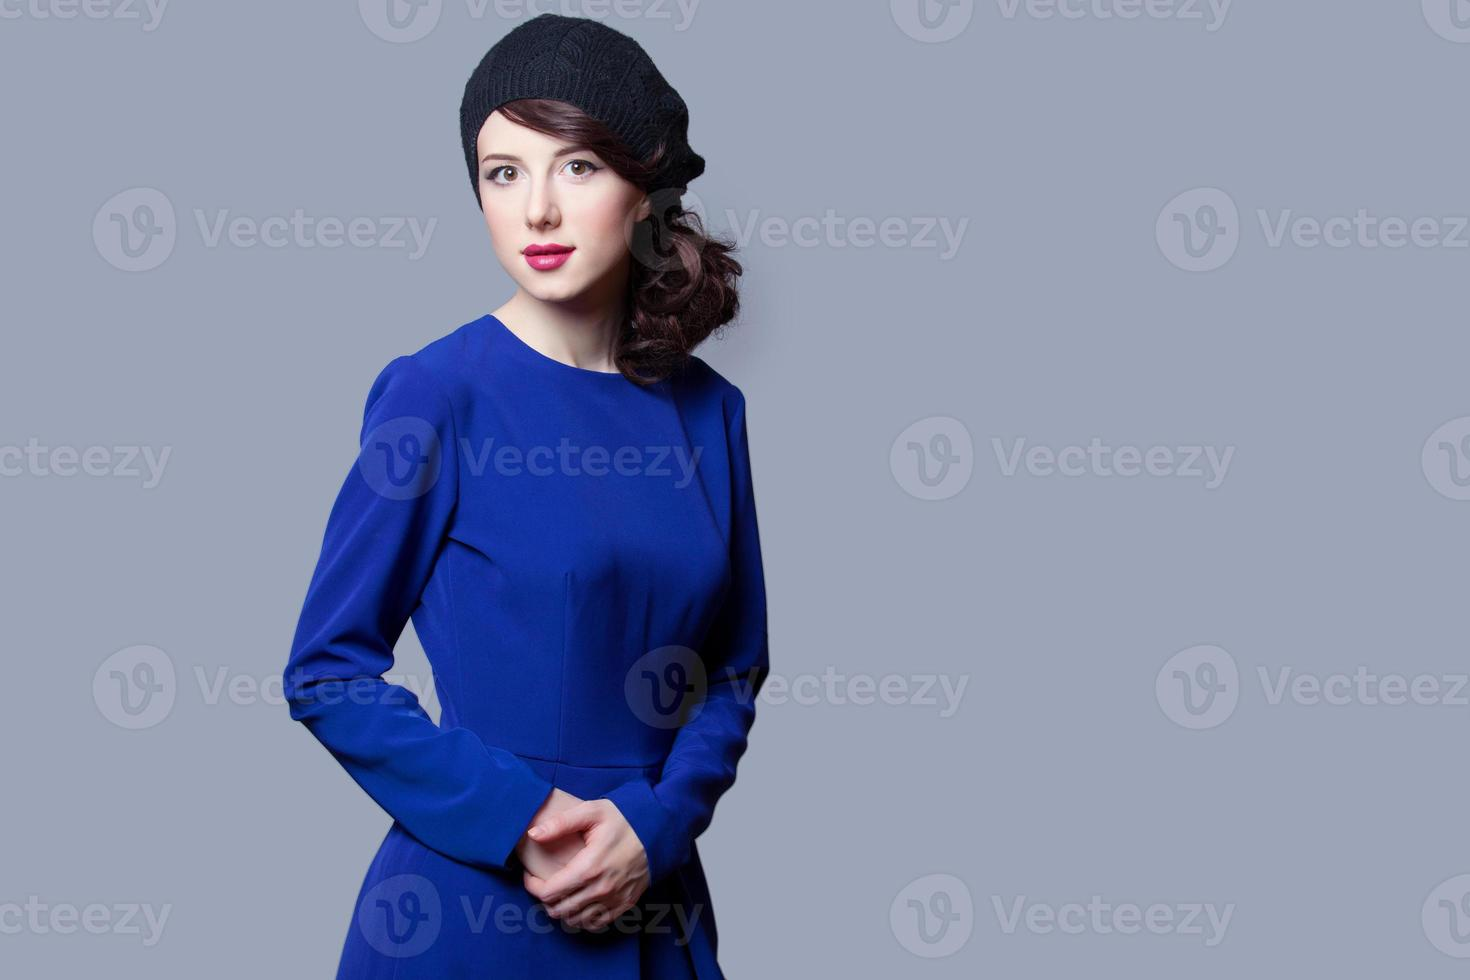 donne in abito blu foto